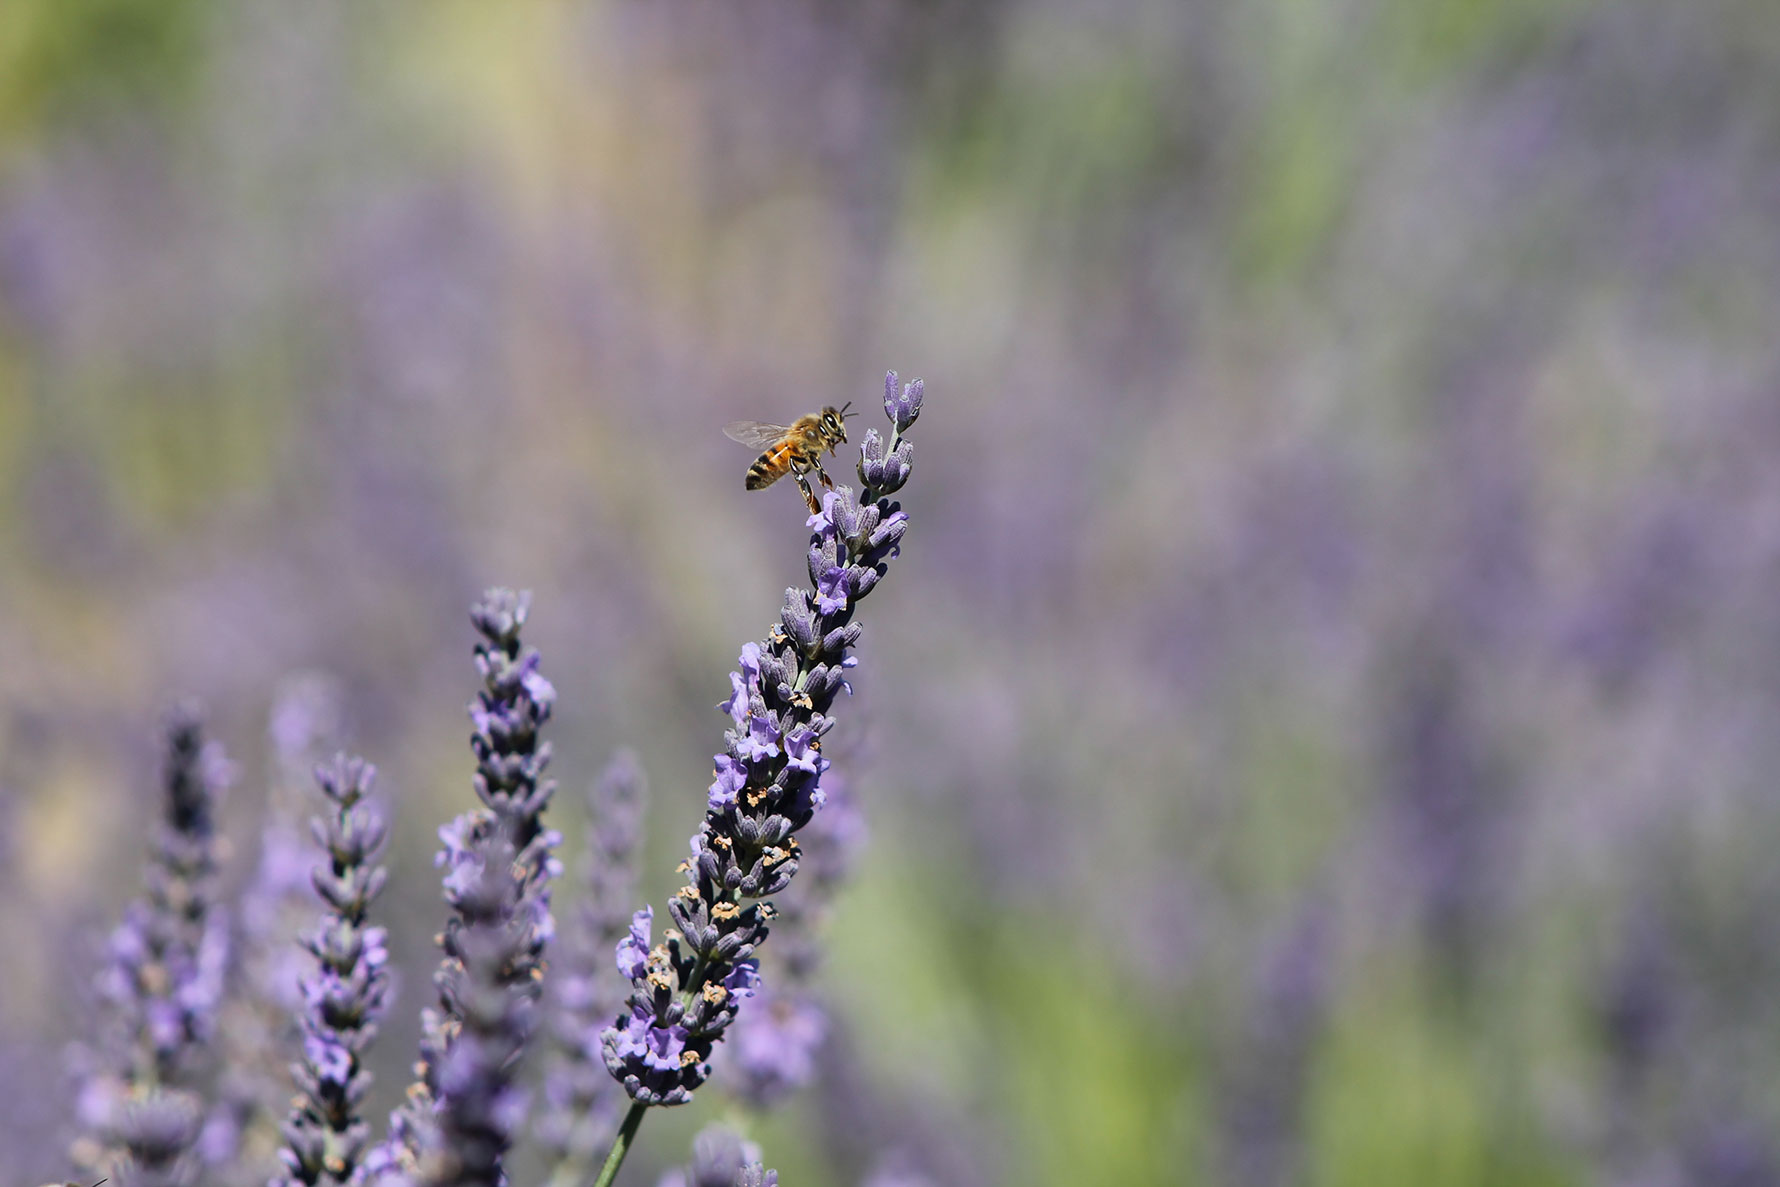 A bee atop purple lavender